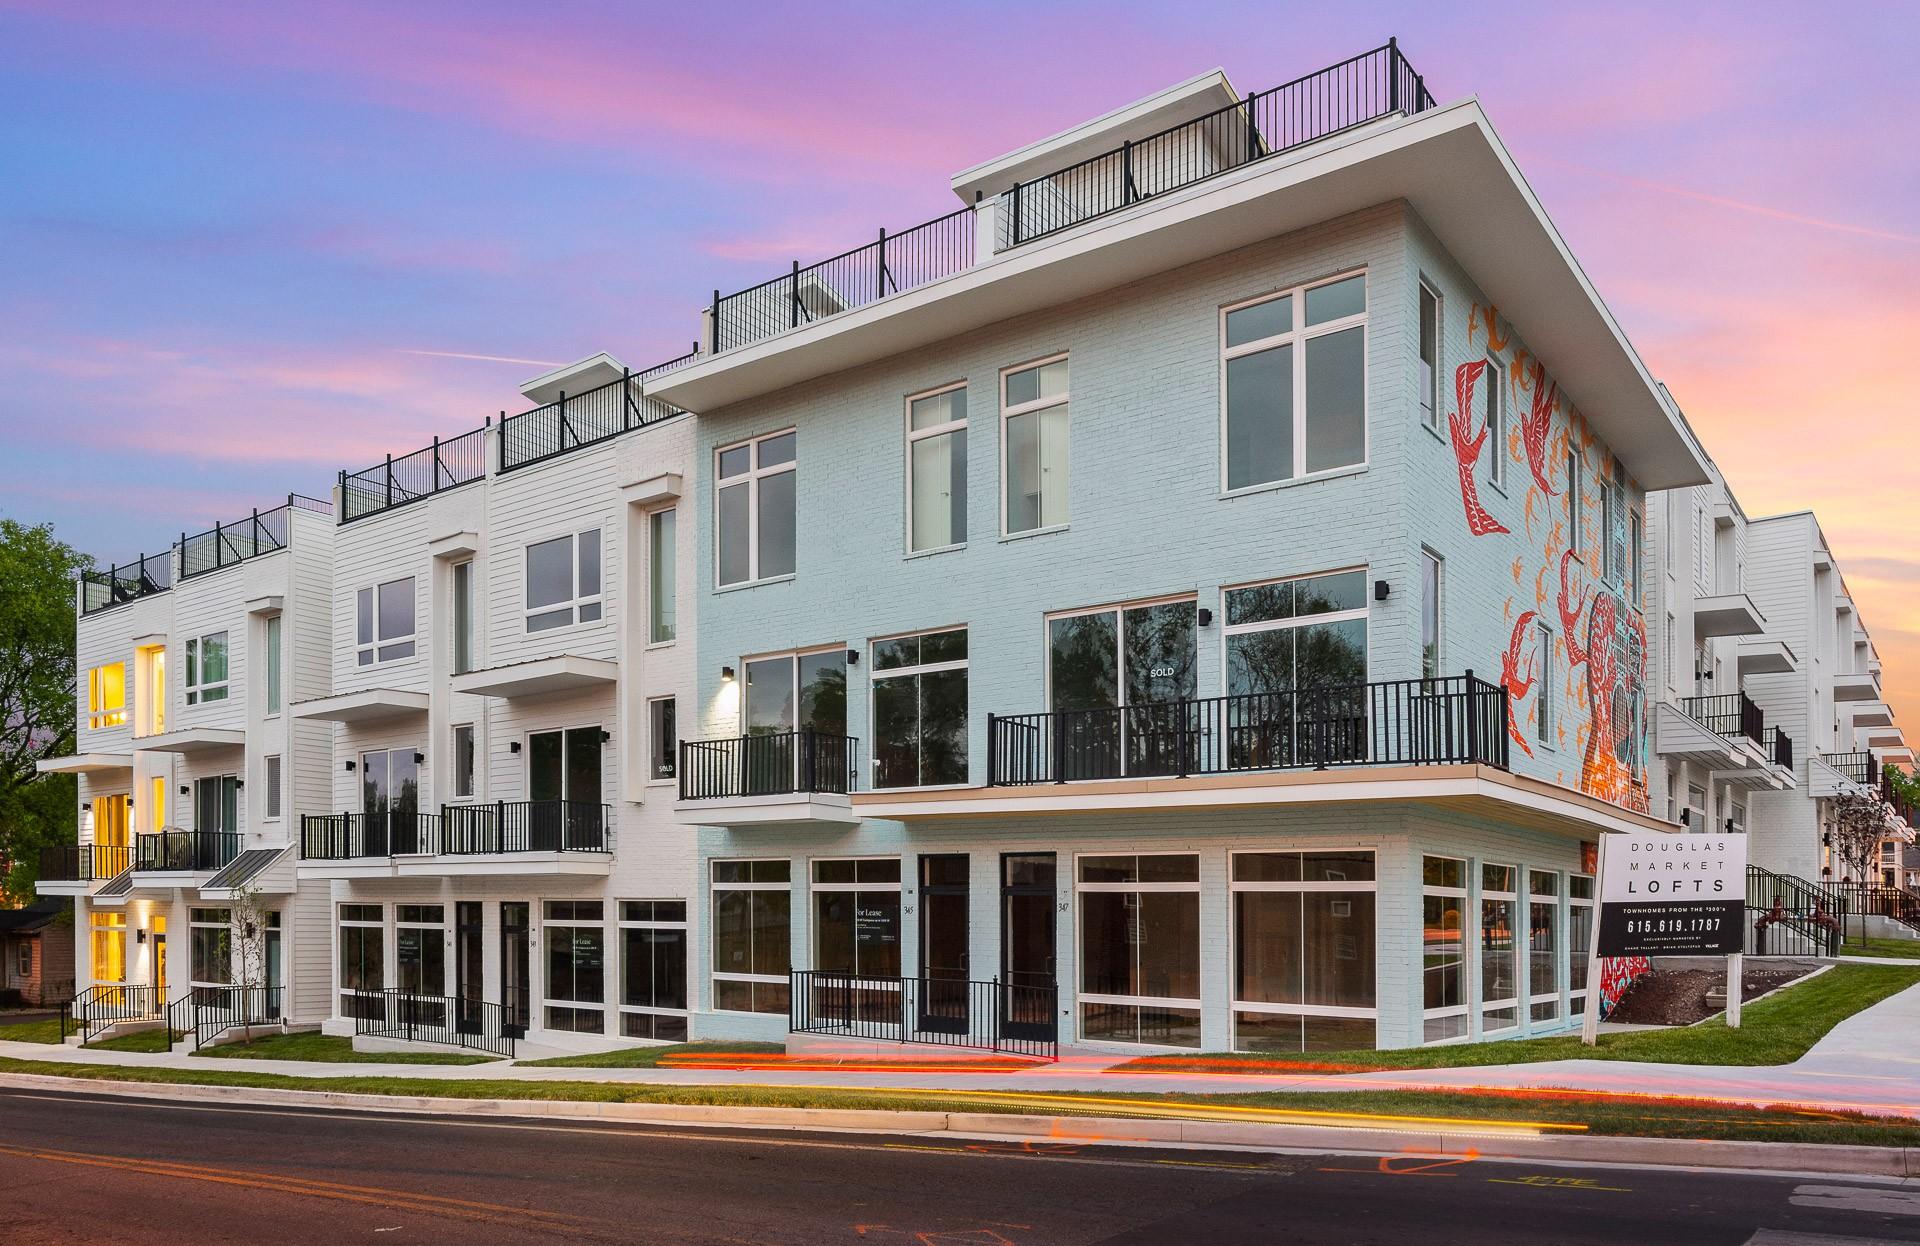 343 Douglas Ave, Nashville, TN 37207 - Nashville, TN real estate listing